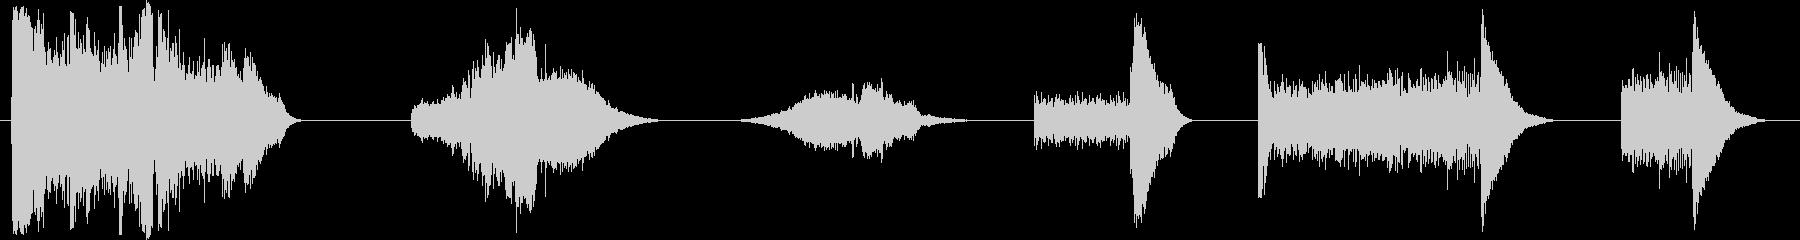 SNARE DRUM、2バージョン...の未再生の波形